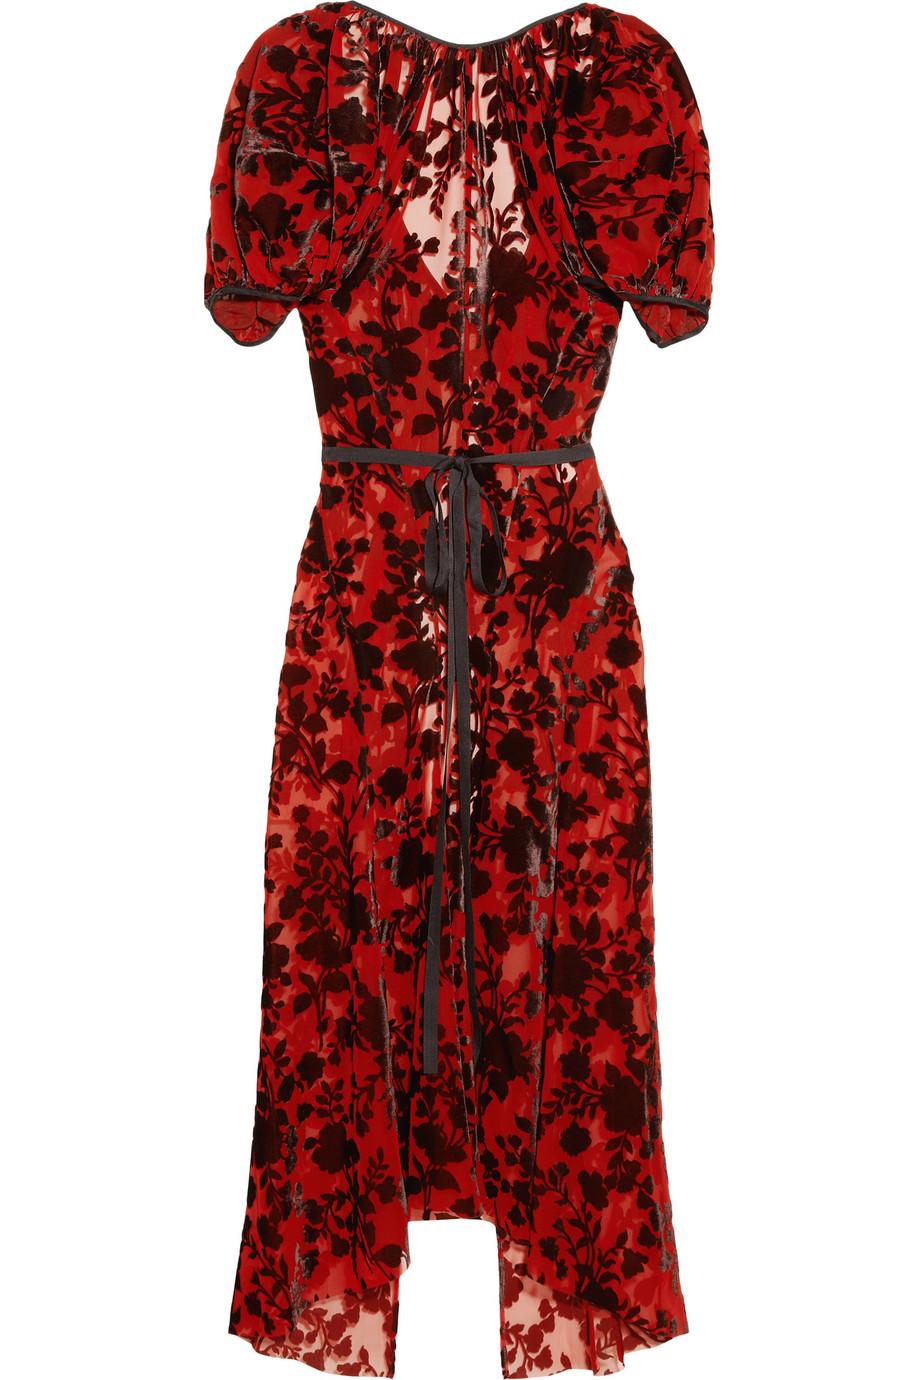 Junya Watanabe Floral Velvet Jacquard Dress In Red Lyst